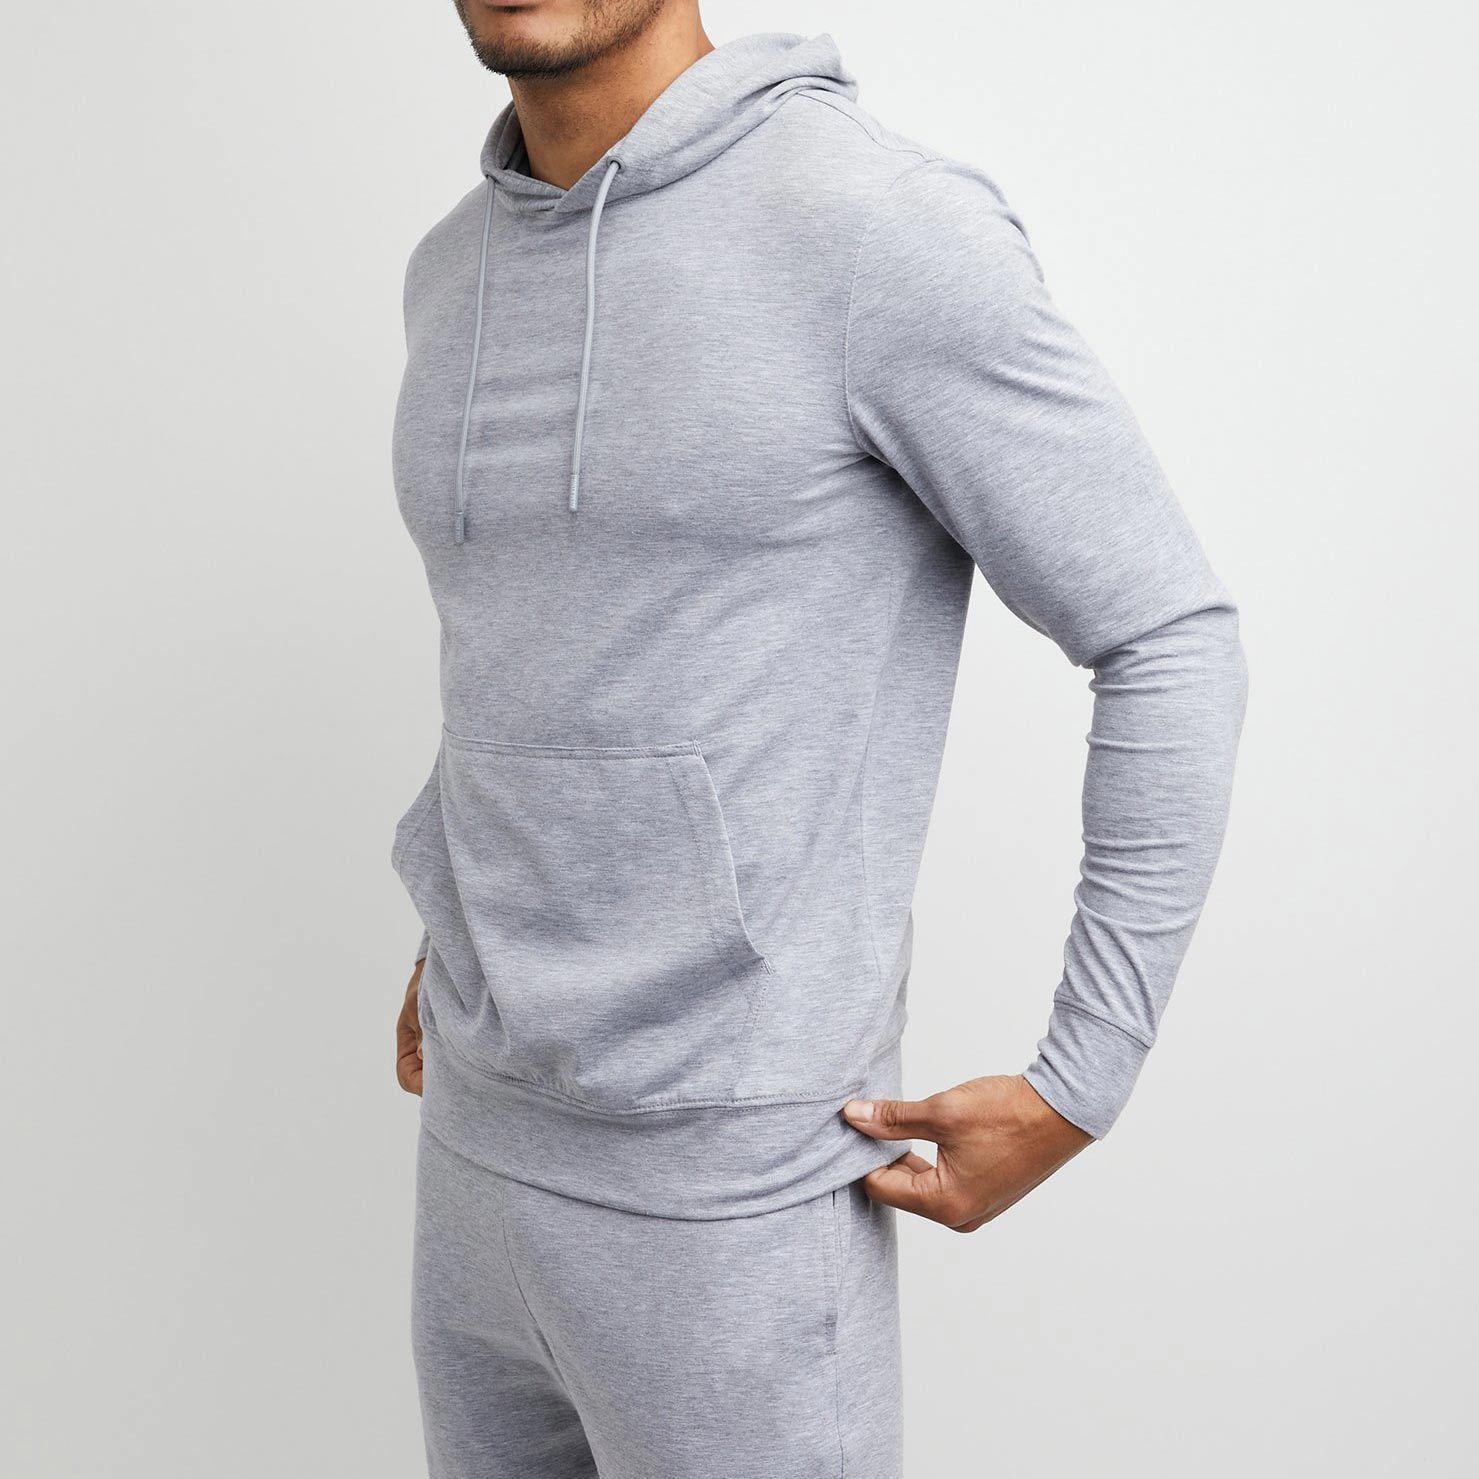 bulk sweatsuits